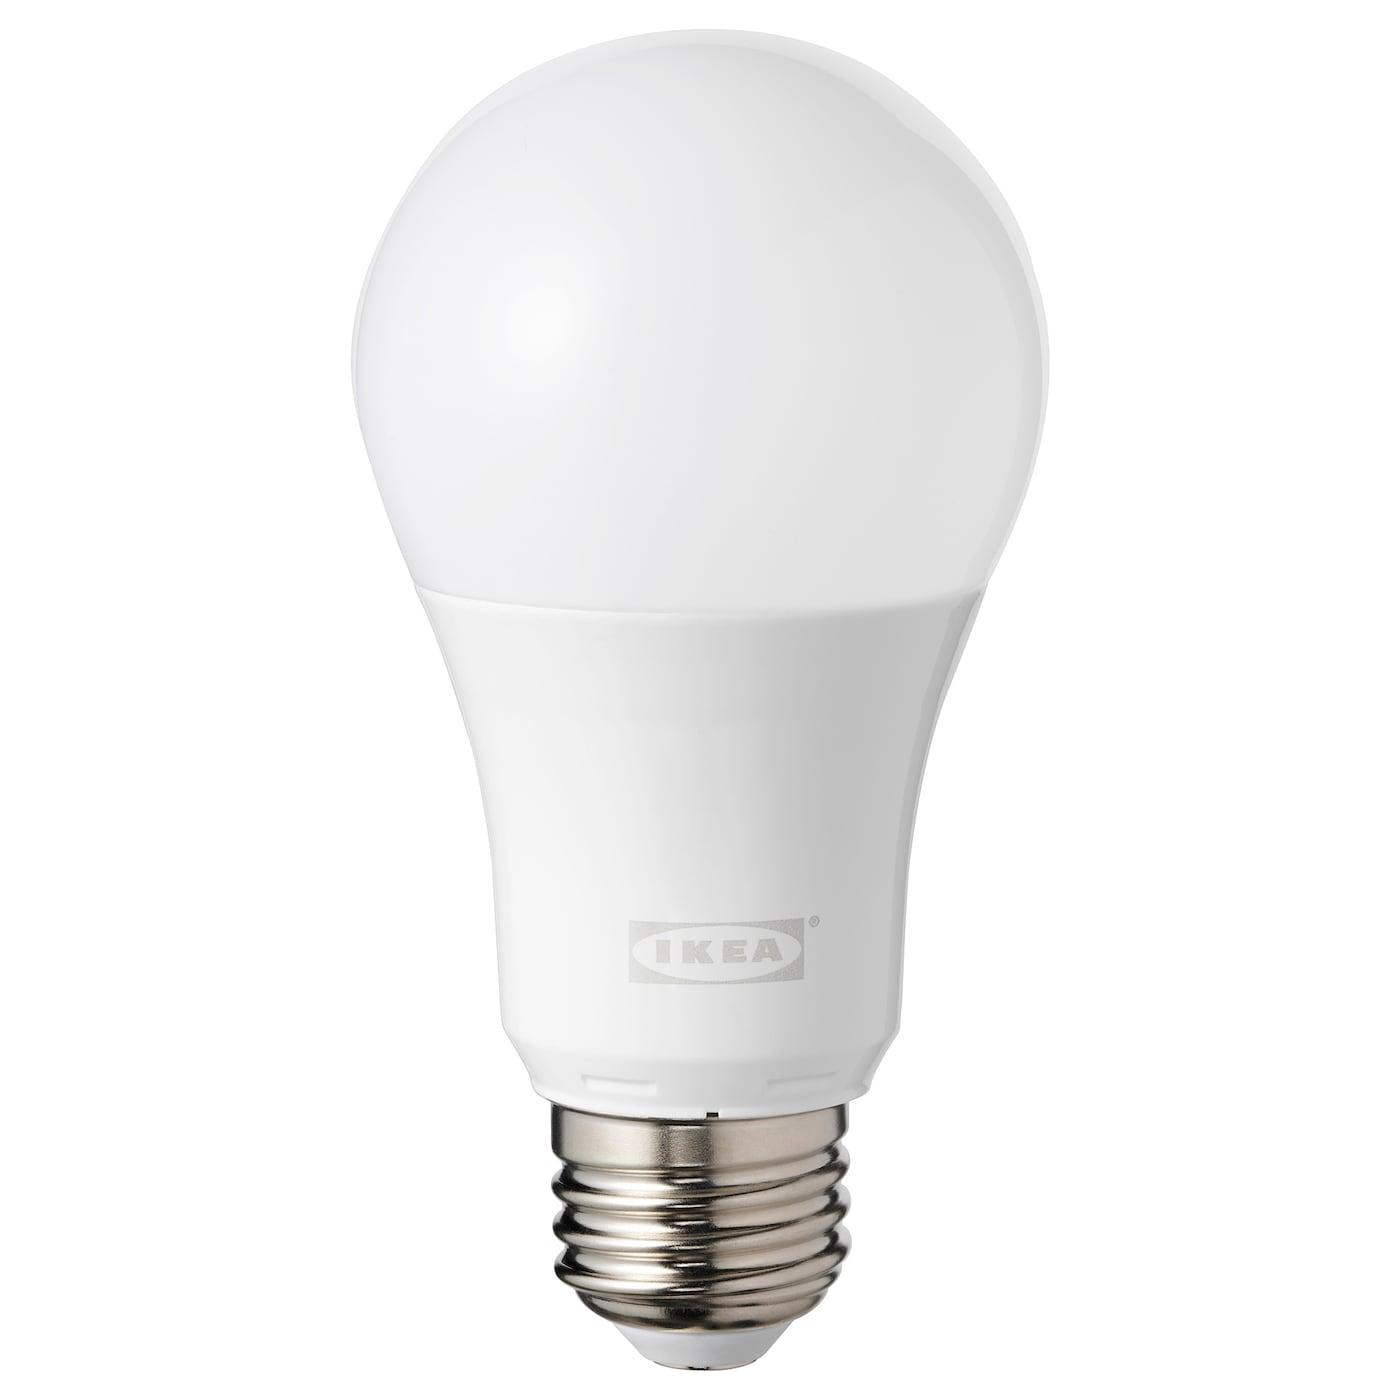 Tradfri Led Bulb E26 600 Lumen Wireless Dimmable Color And White Spectrum Color And White Spectrum Globe Opal Ikea